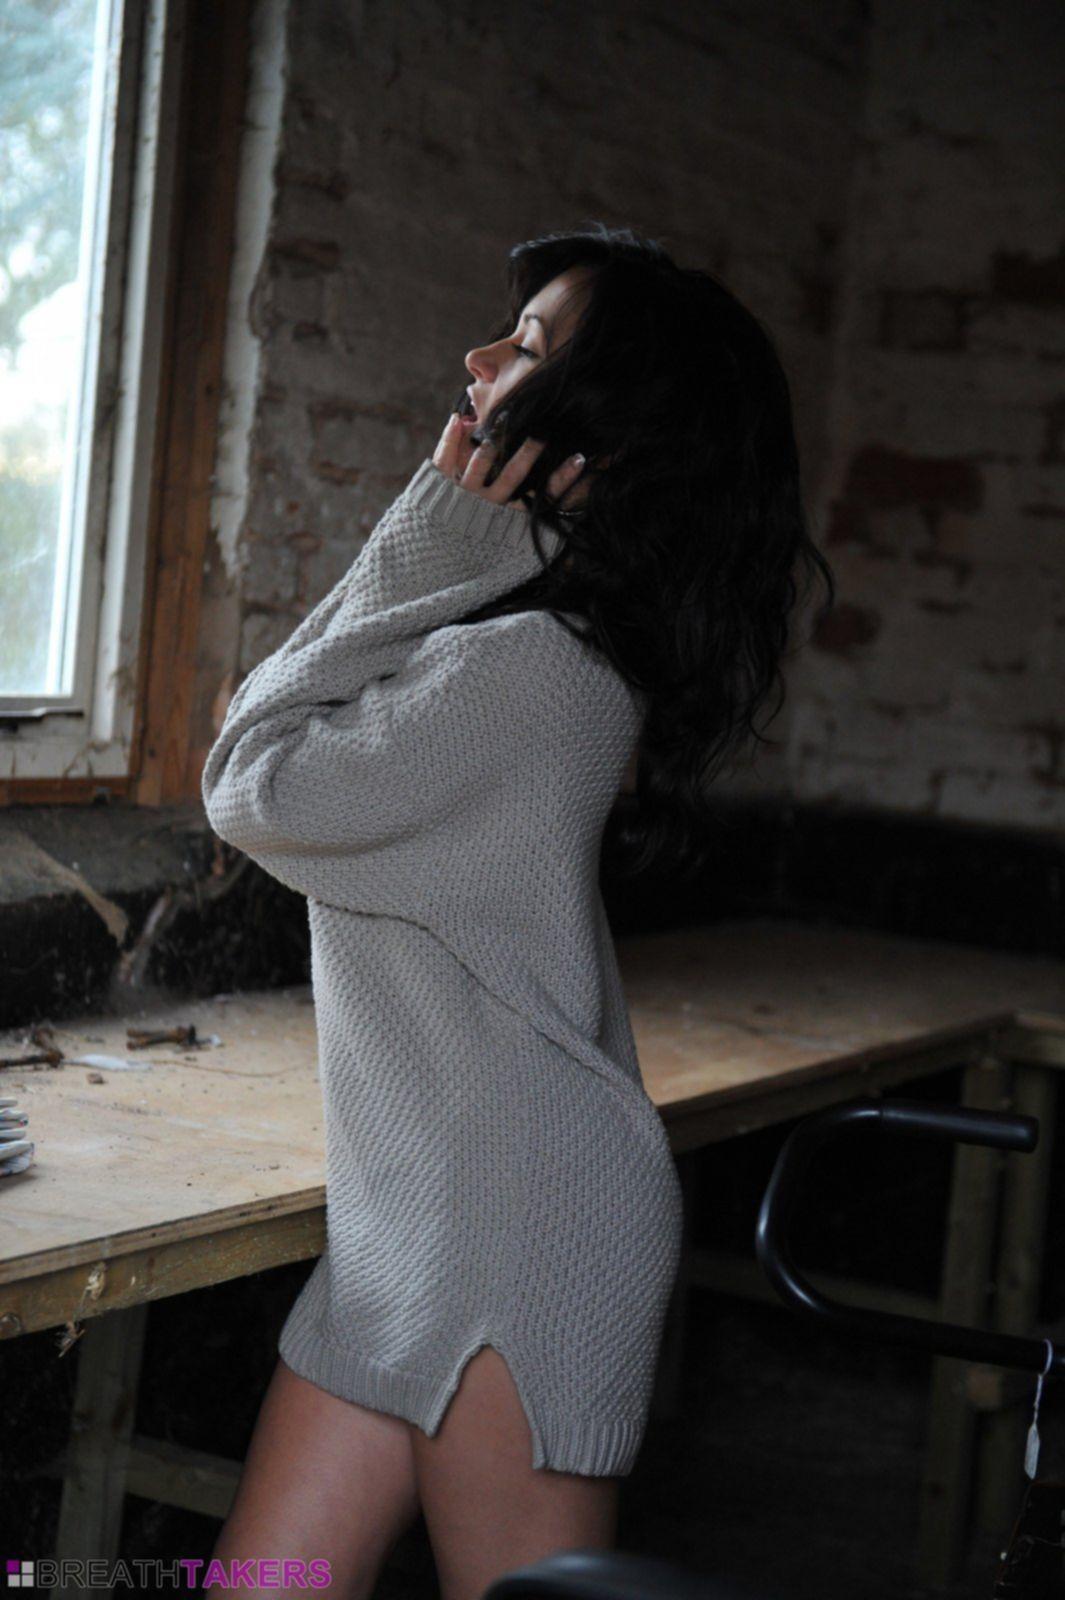 Брюнетка в сапогах и кофте без трусов - фото